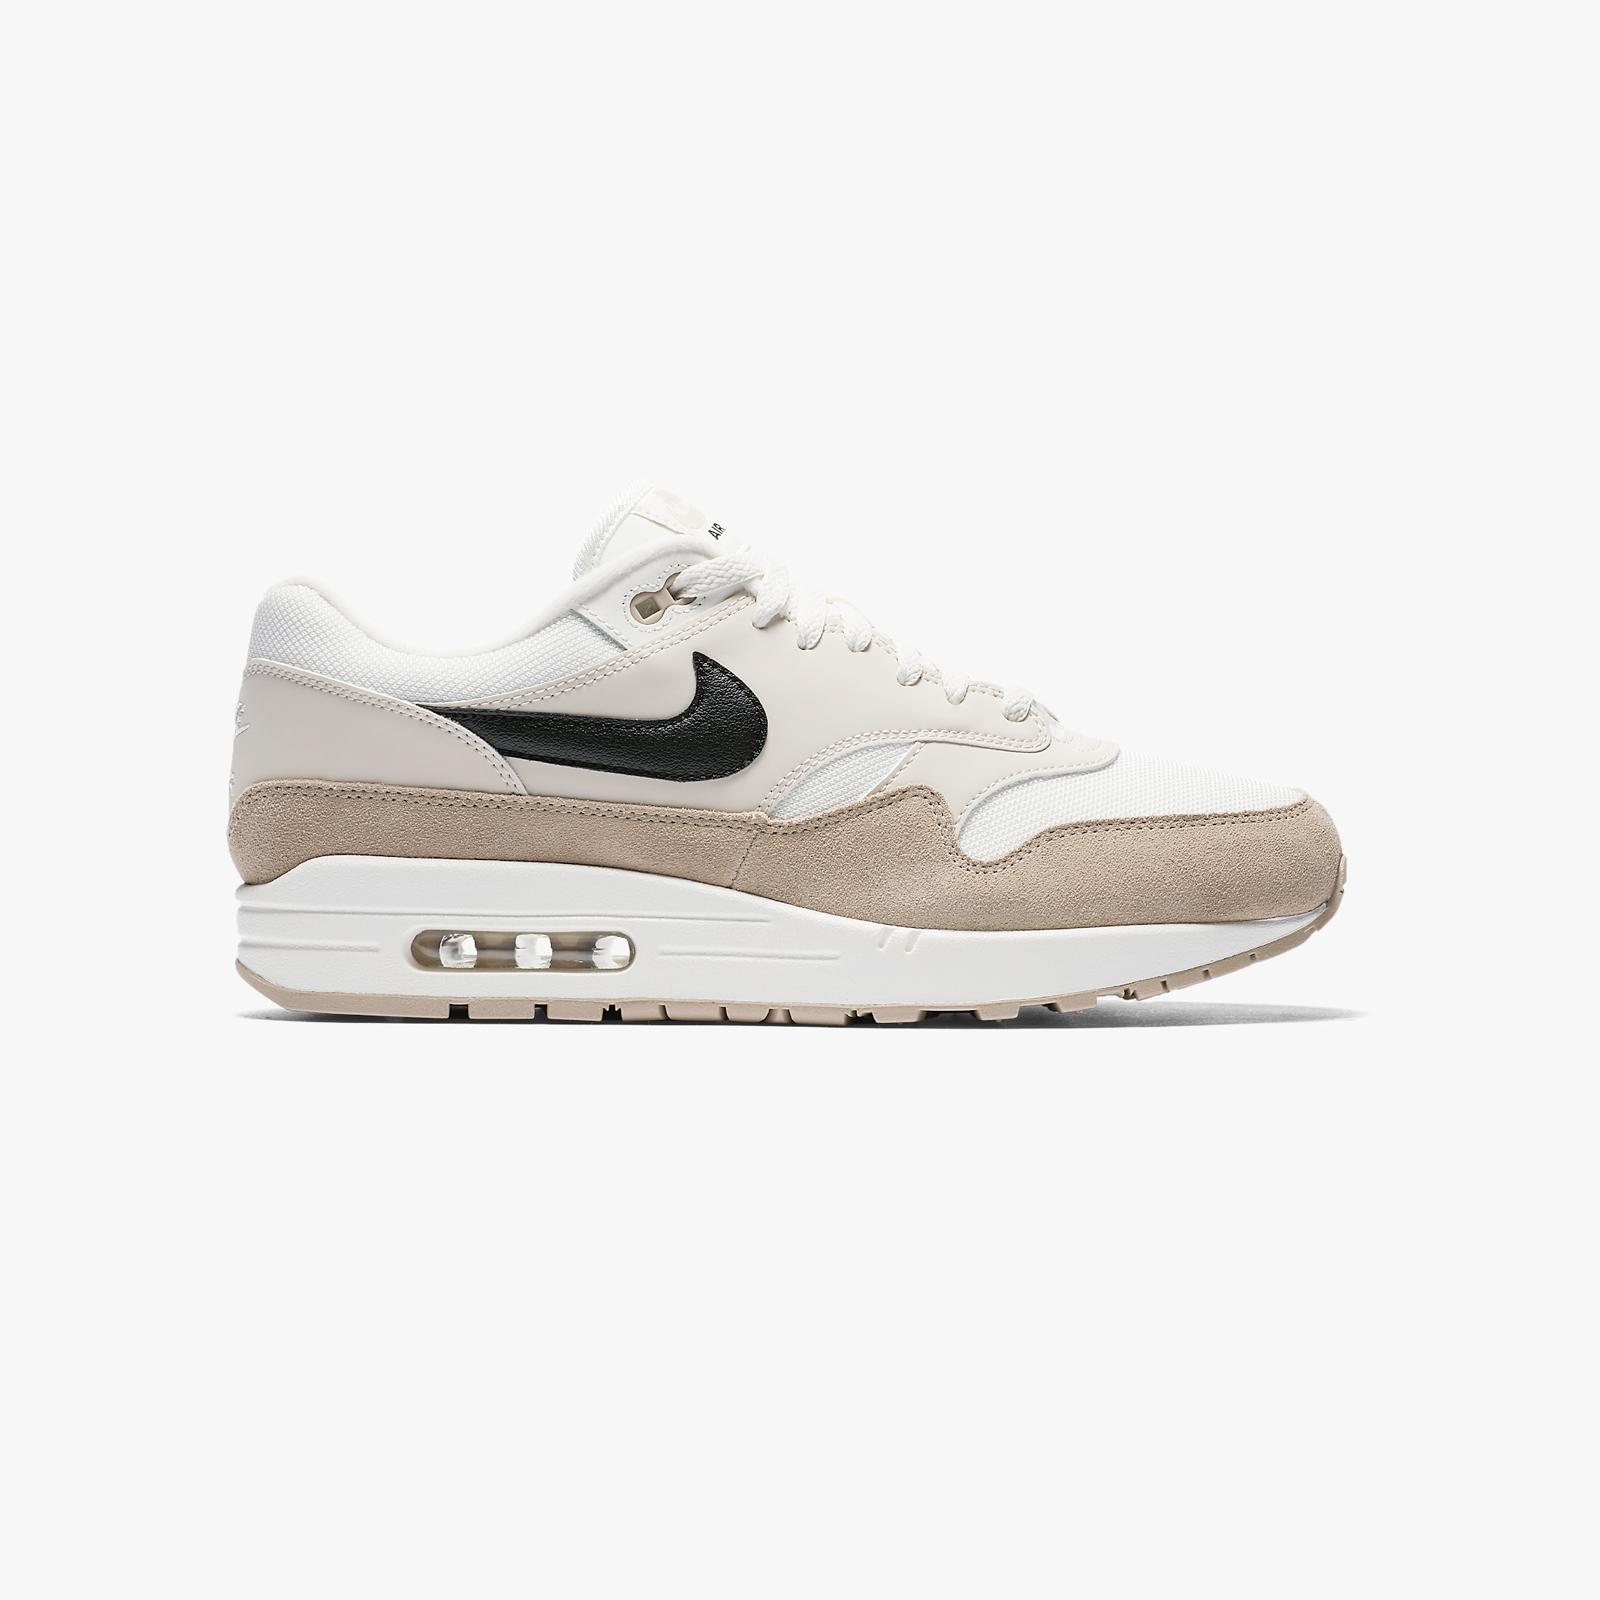 Nike Air Max 1 - Ah8145-200